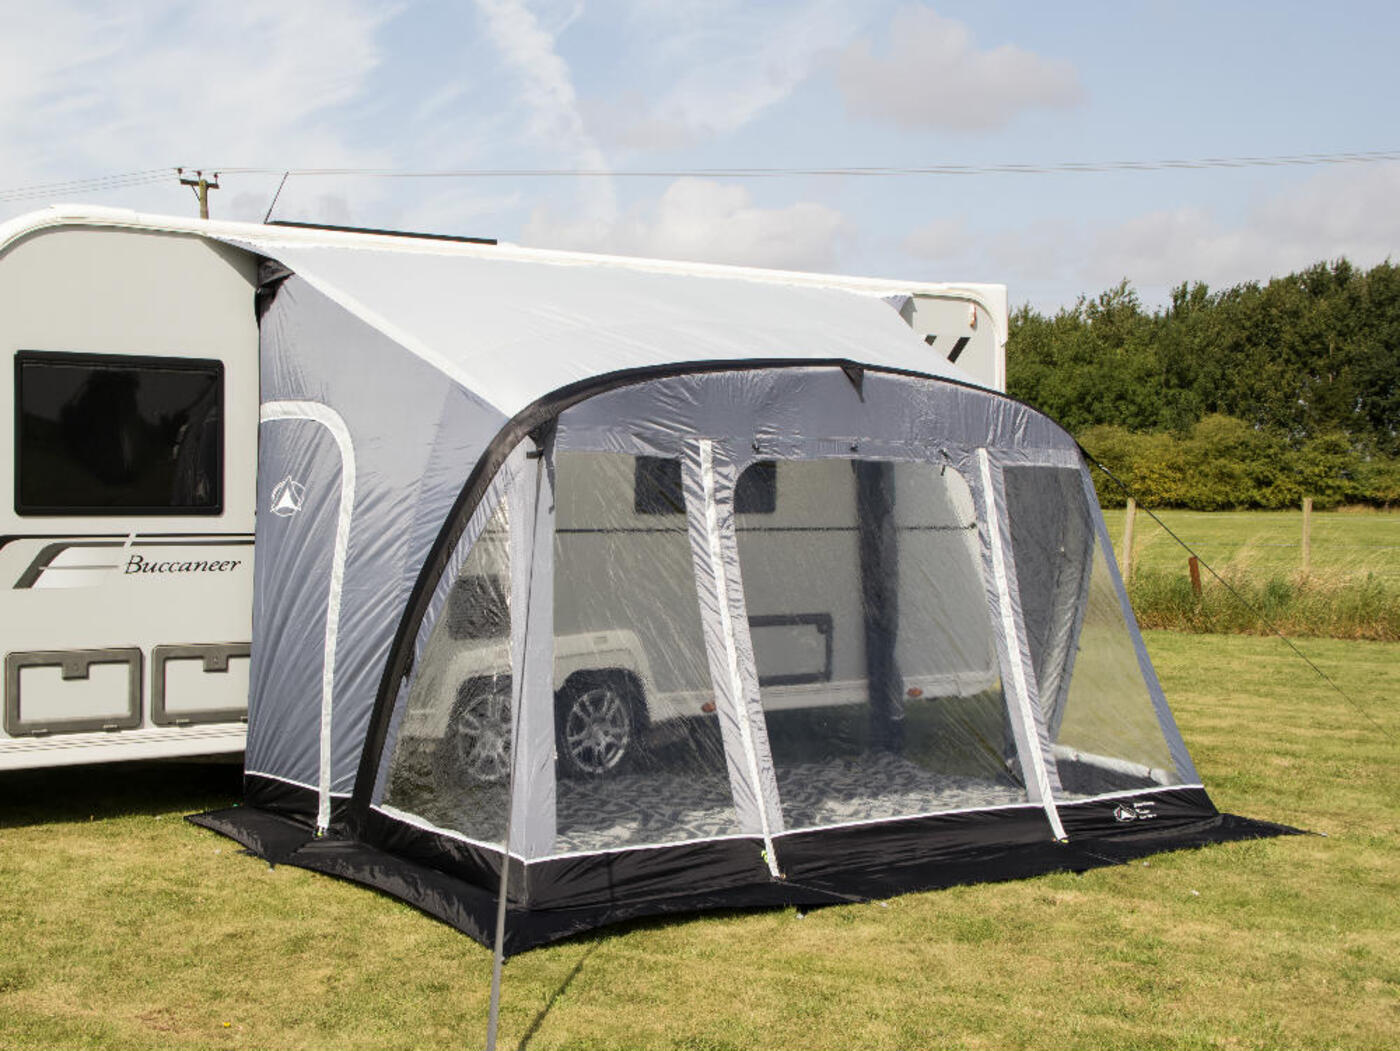 2018 Sunncamp Swift 390 AIR Plus Caravan Porch Awning